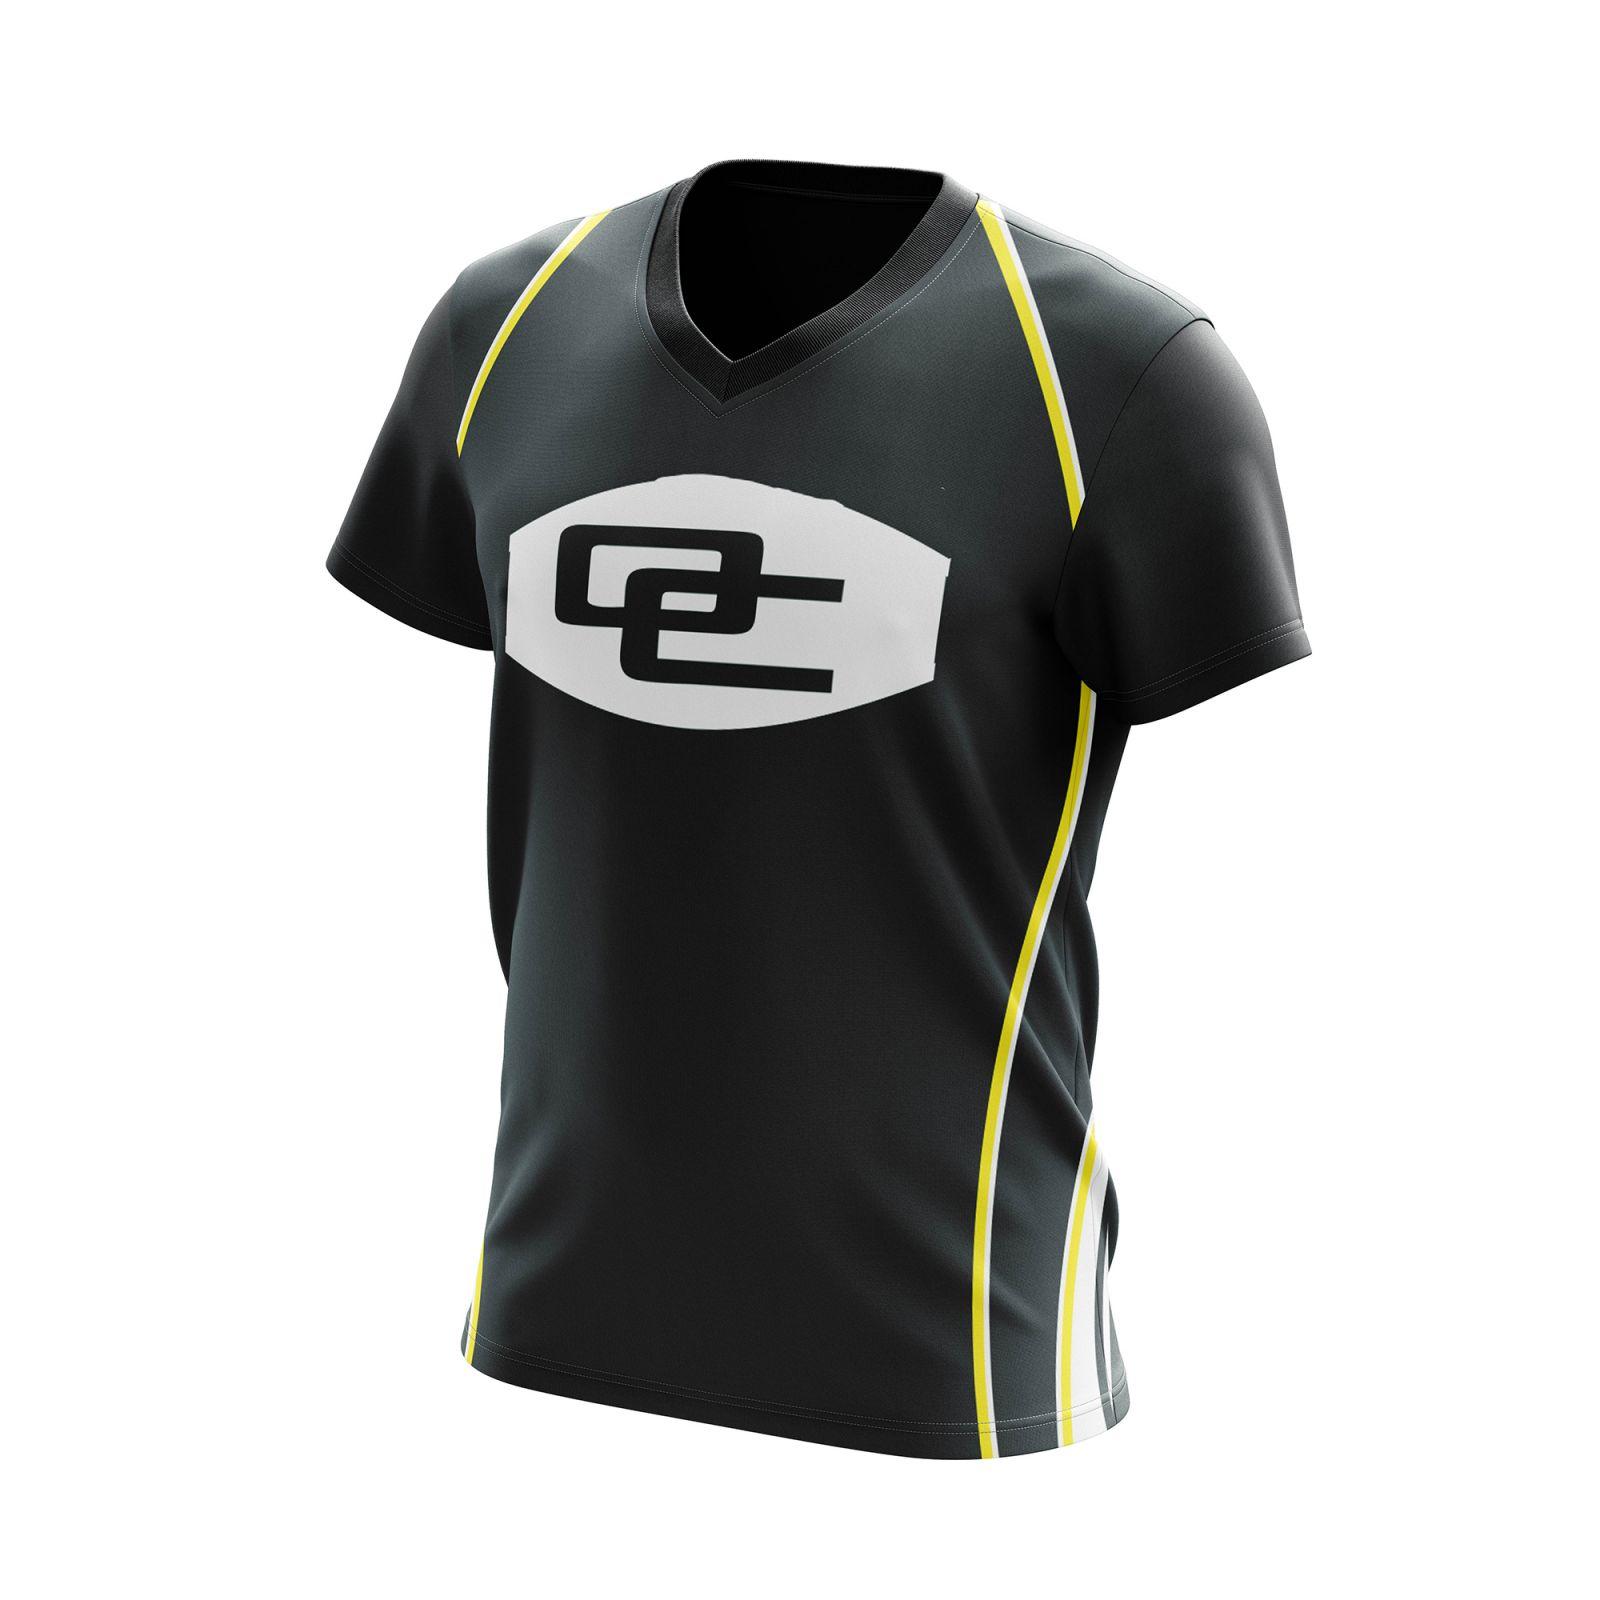 sports jersey